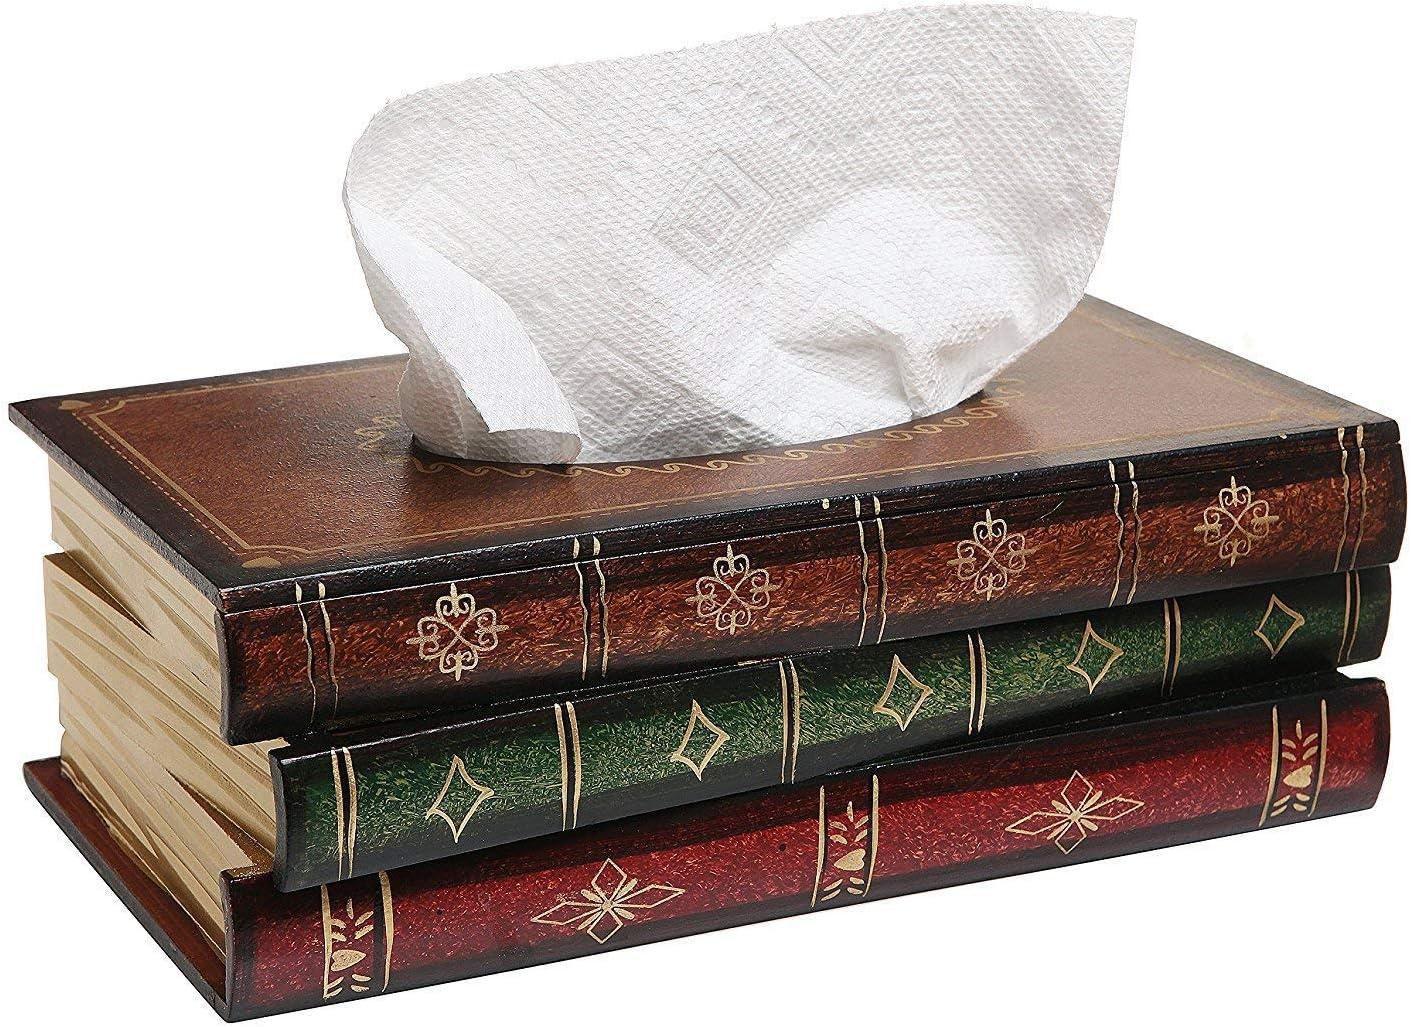 QSEVEN - Soporte para Caja de pañuelos, Caja de pañuelos ...